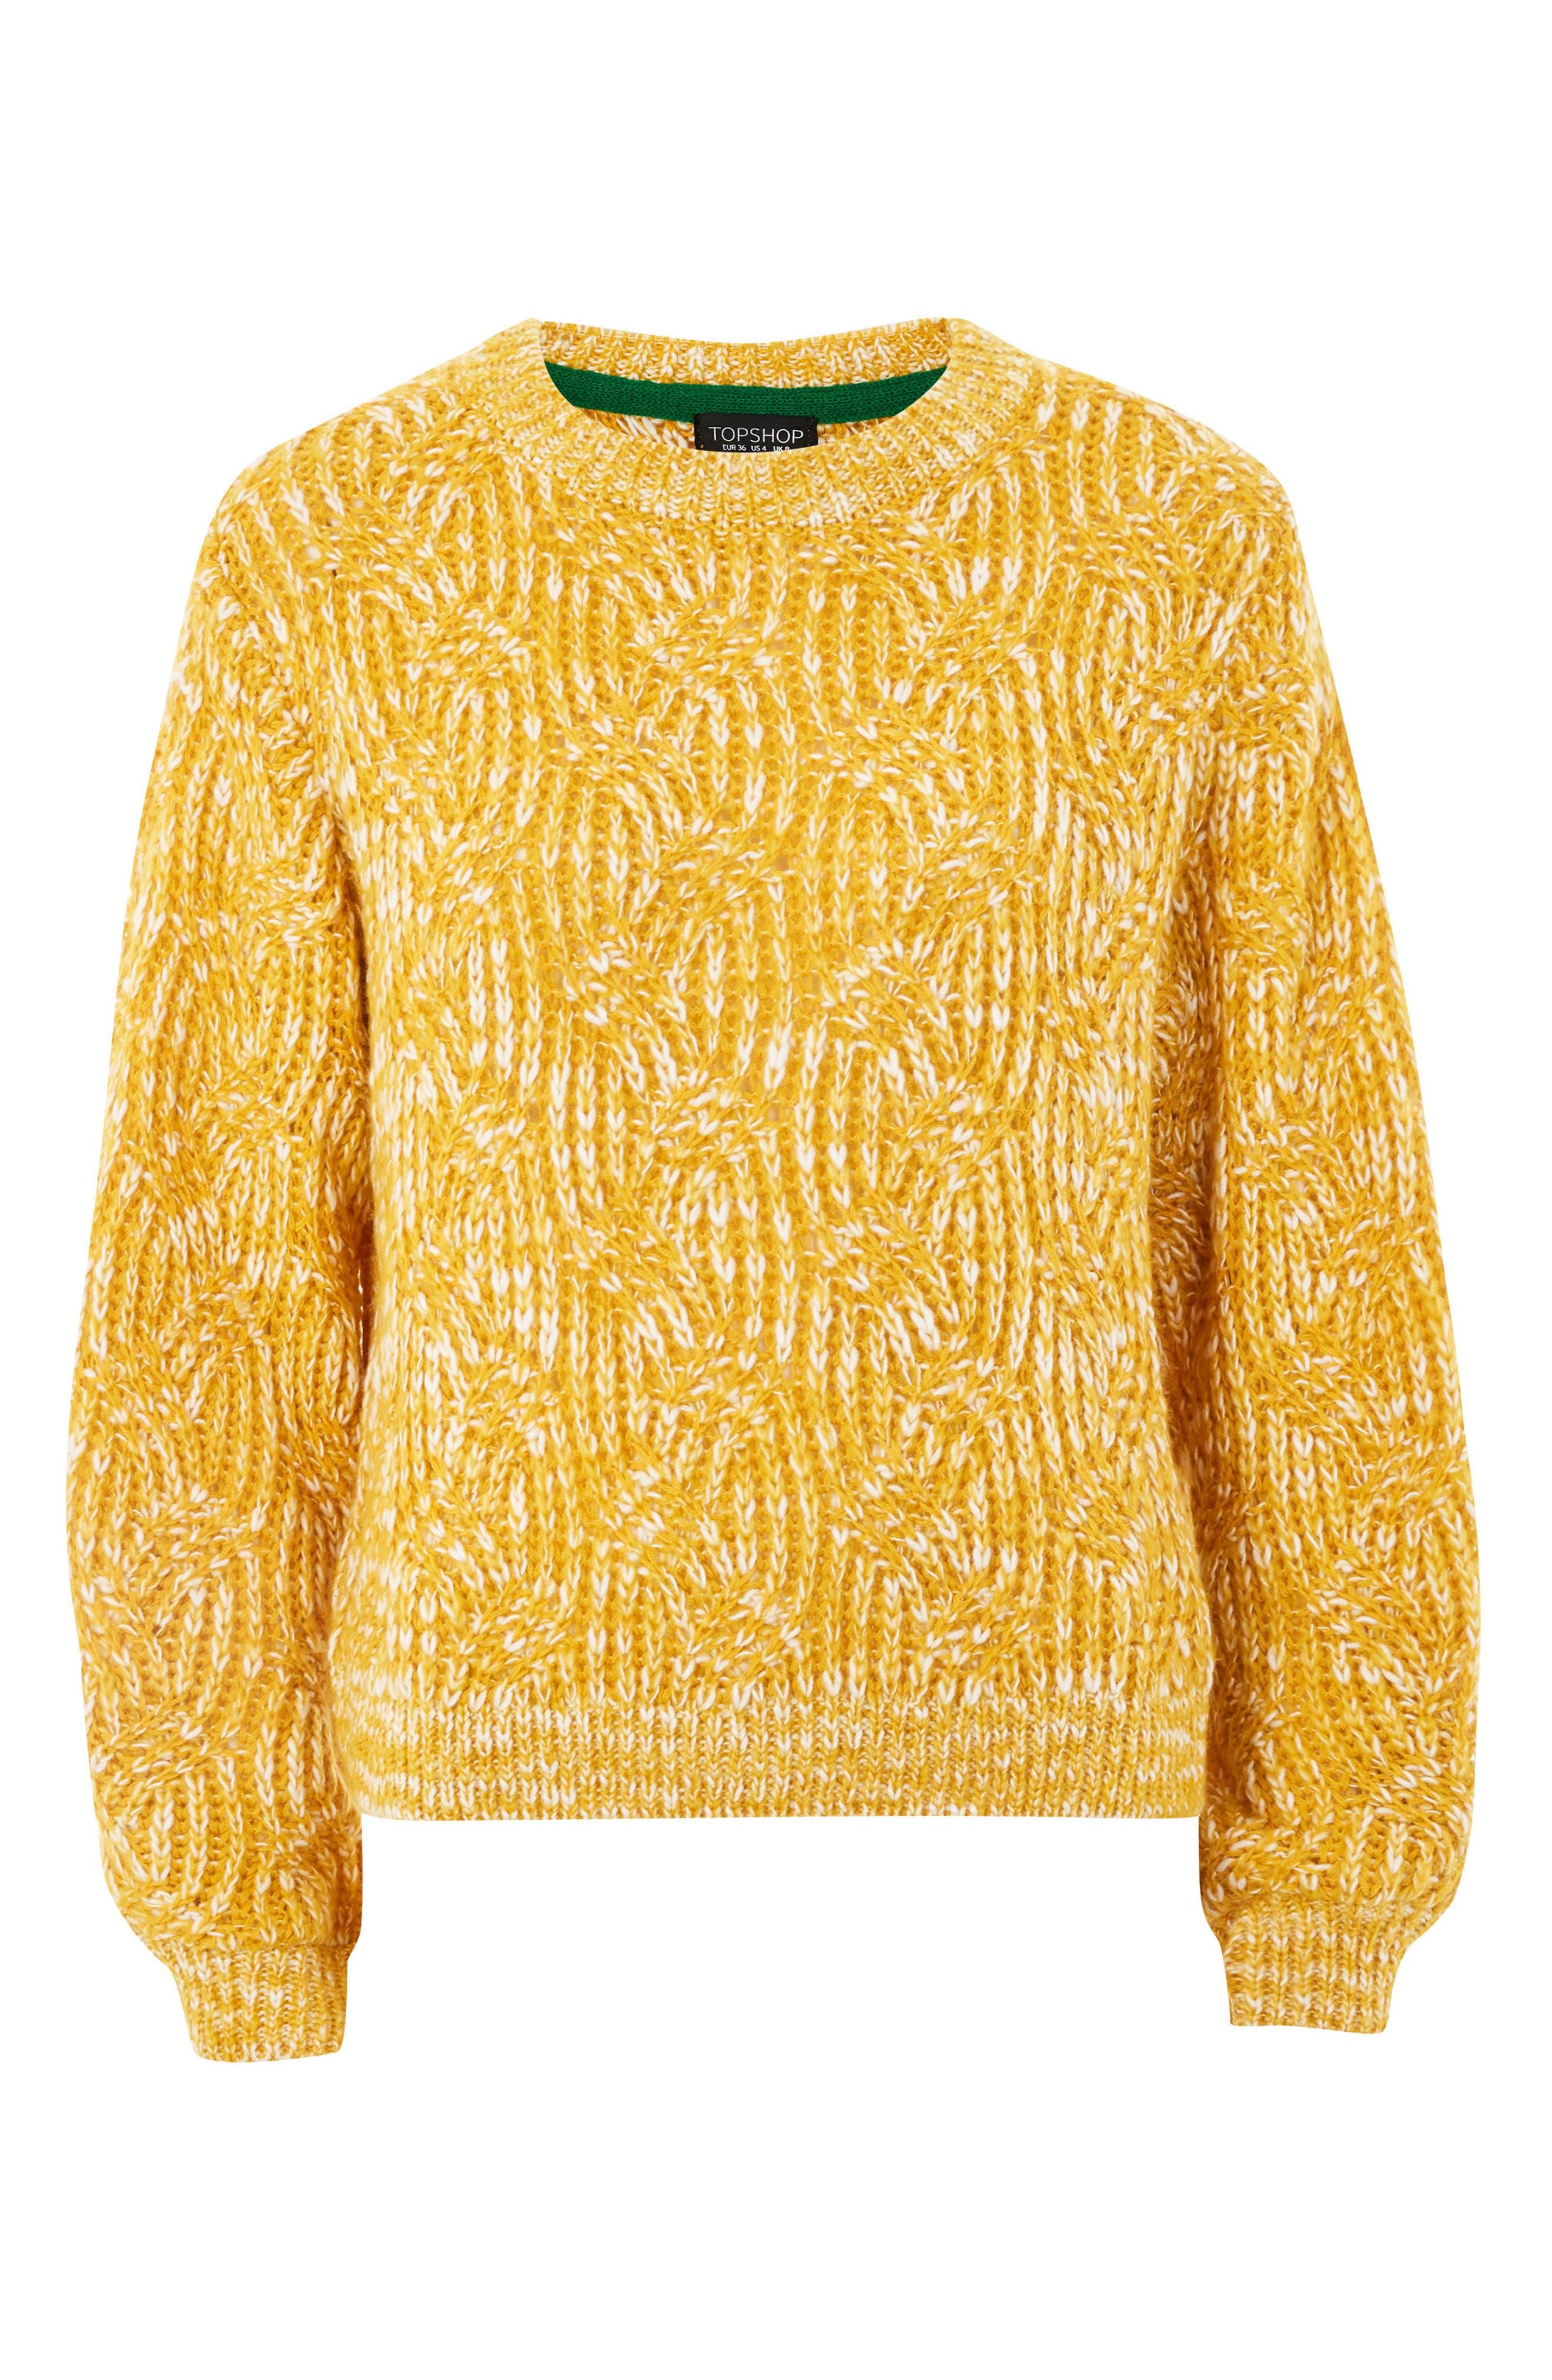 Swirl Tuck Sweater,                             Alternate thumbnail 8, color,